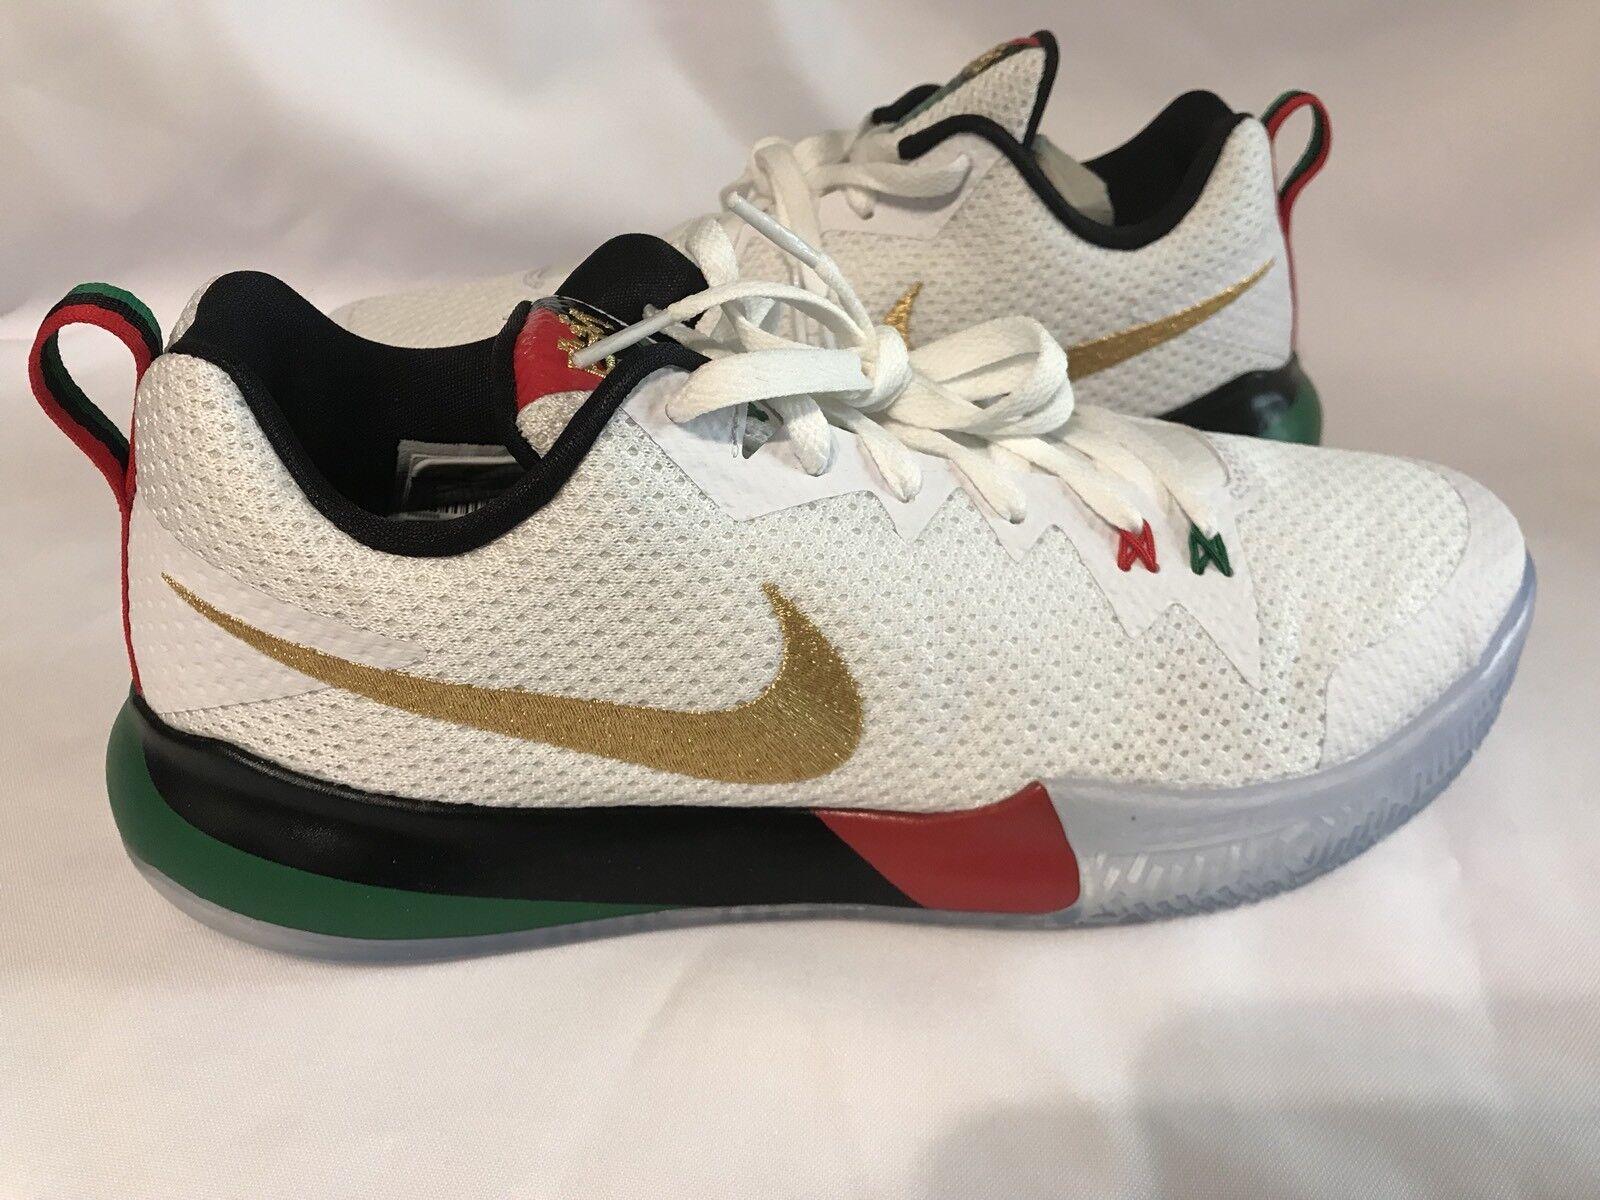 Nike bhm nero history aq9580 month aq9580 history 100 zoom hyperdunk rosso verde scarpe taglia 11 8f0005